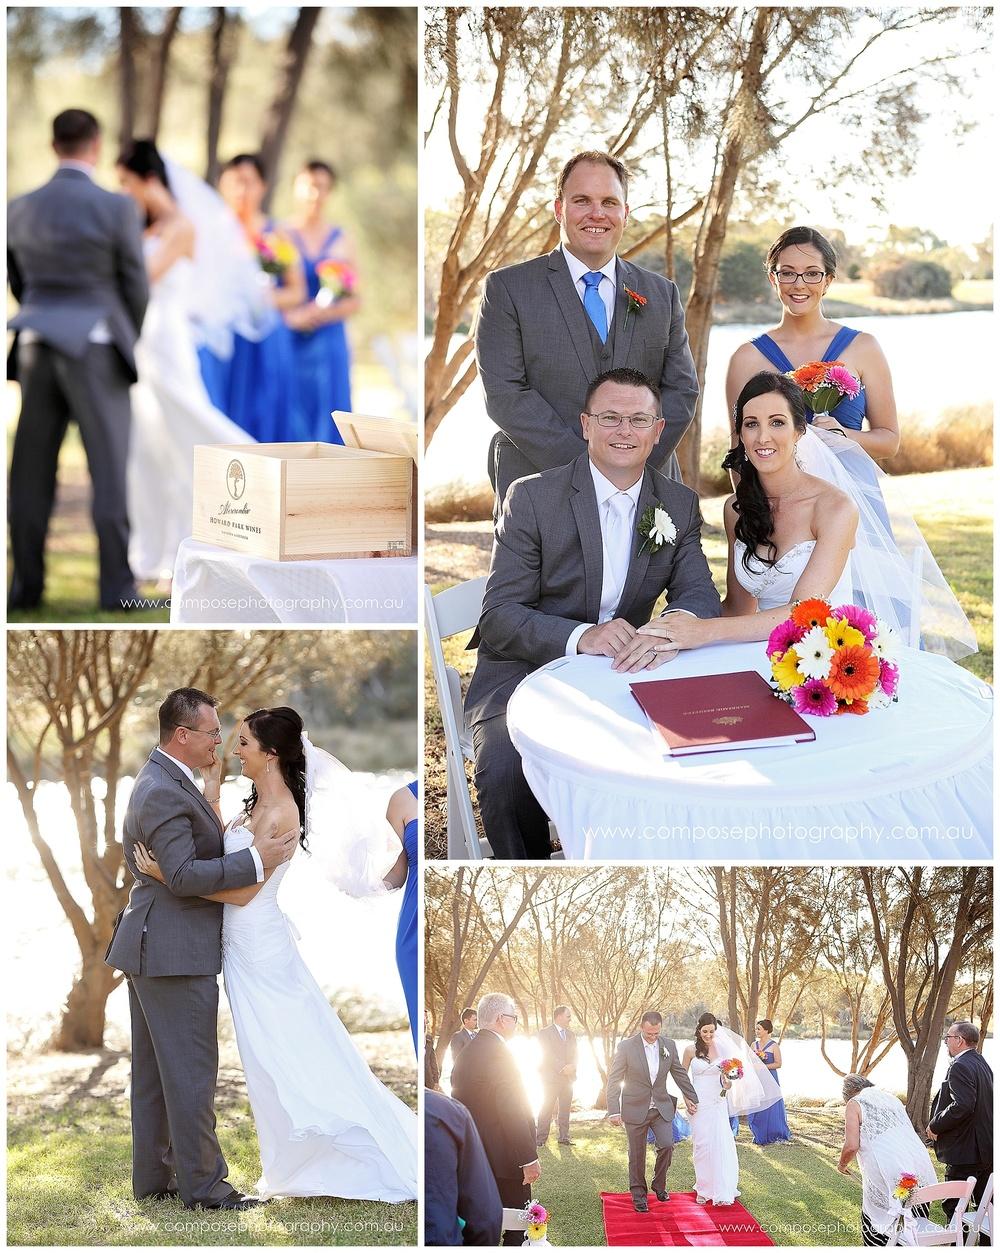 Wedding Ceremony at Ascot Quays